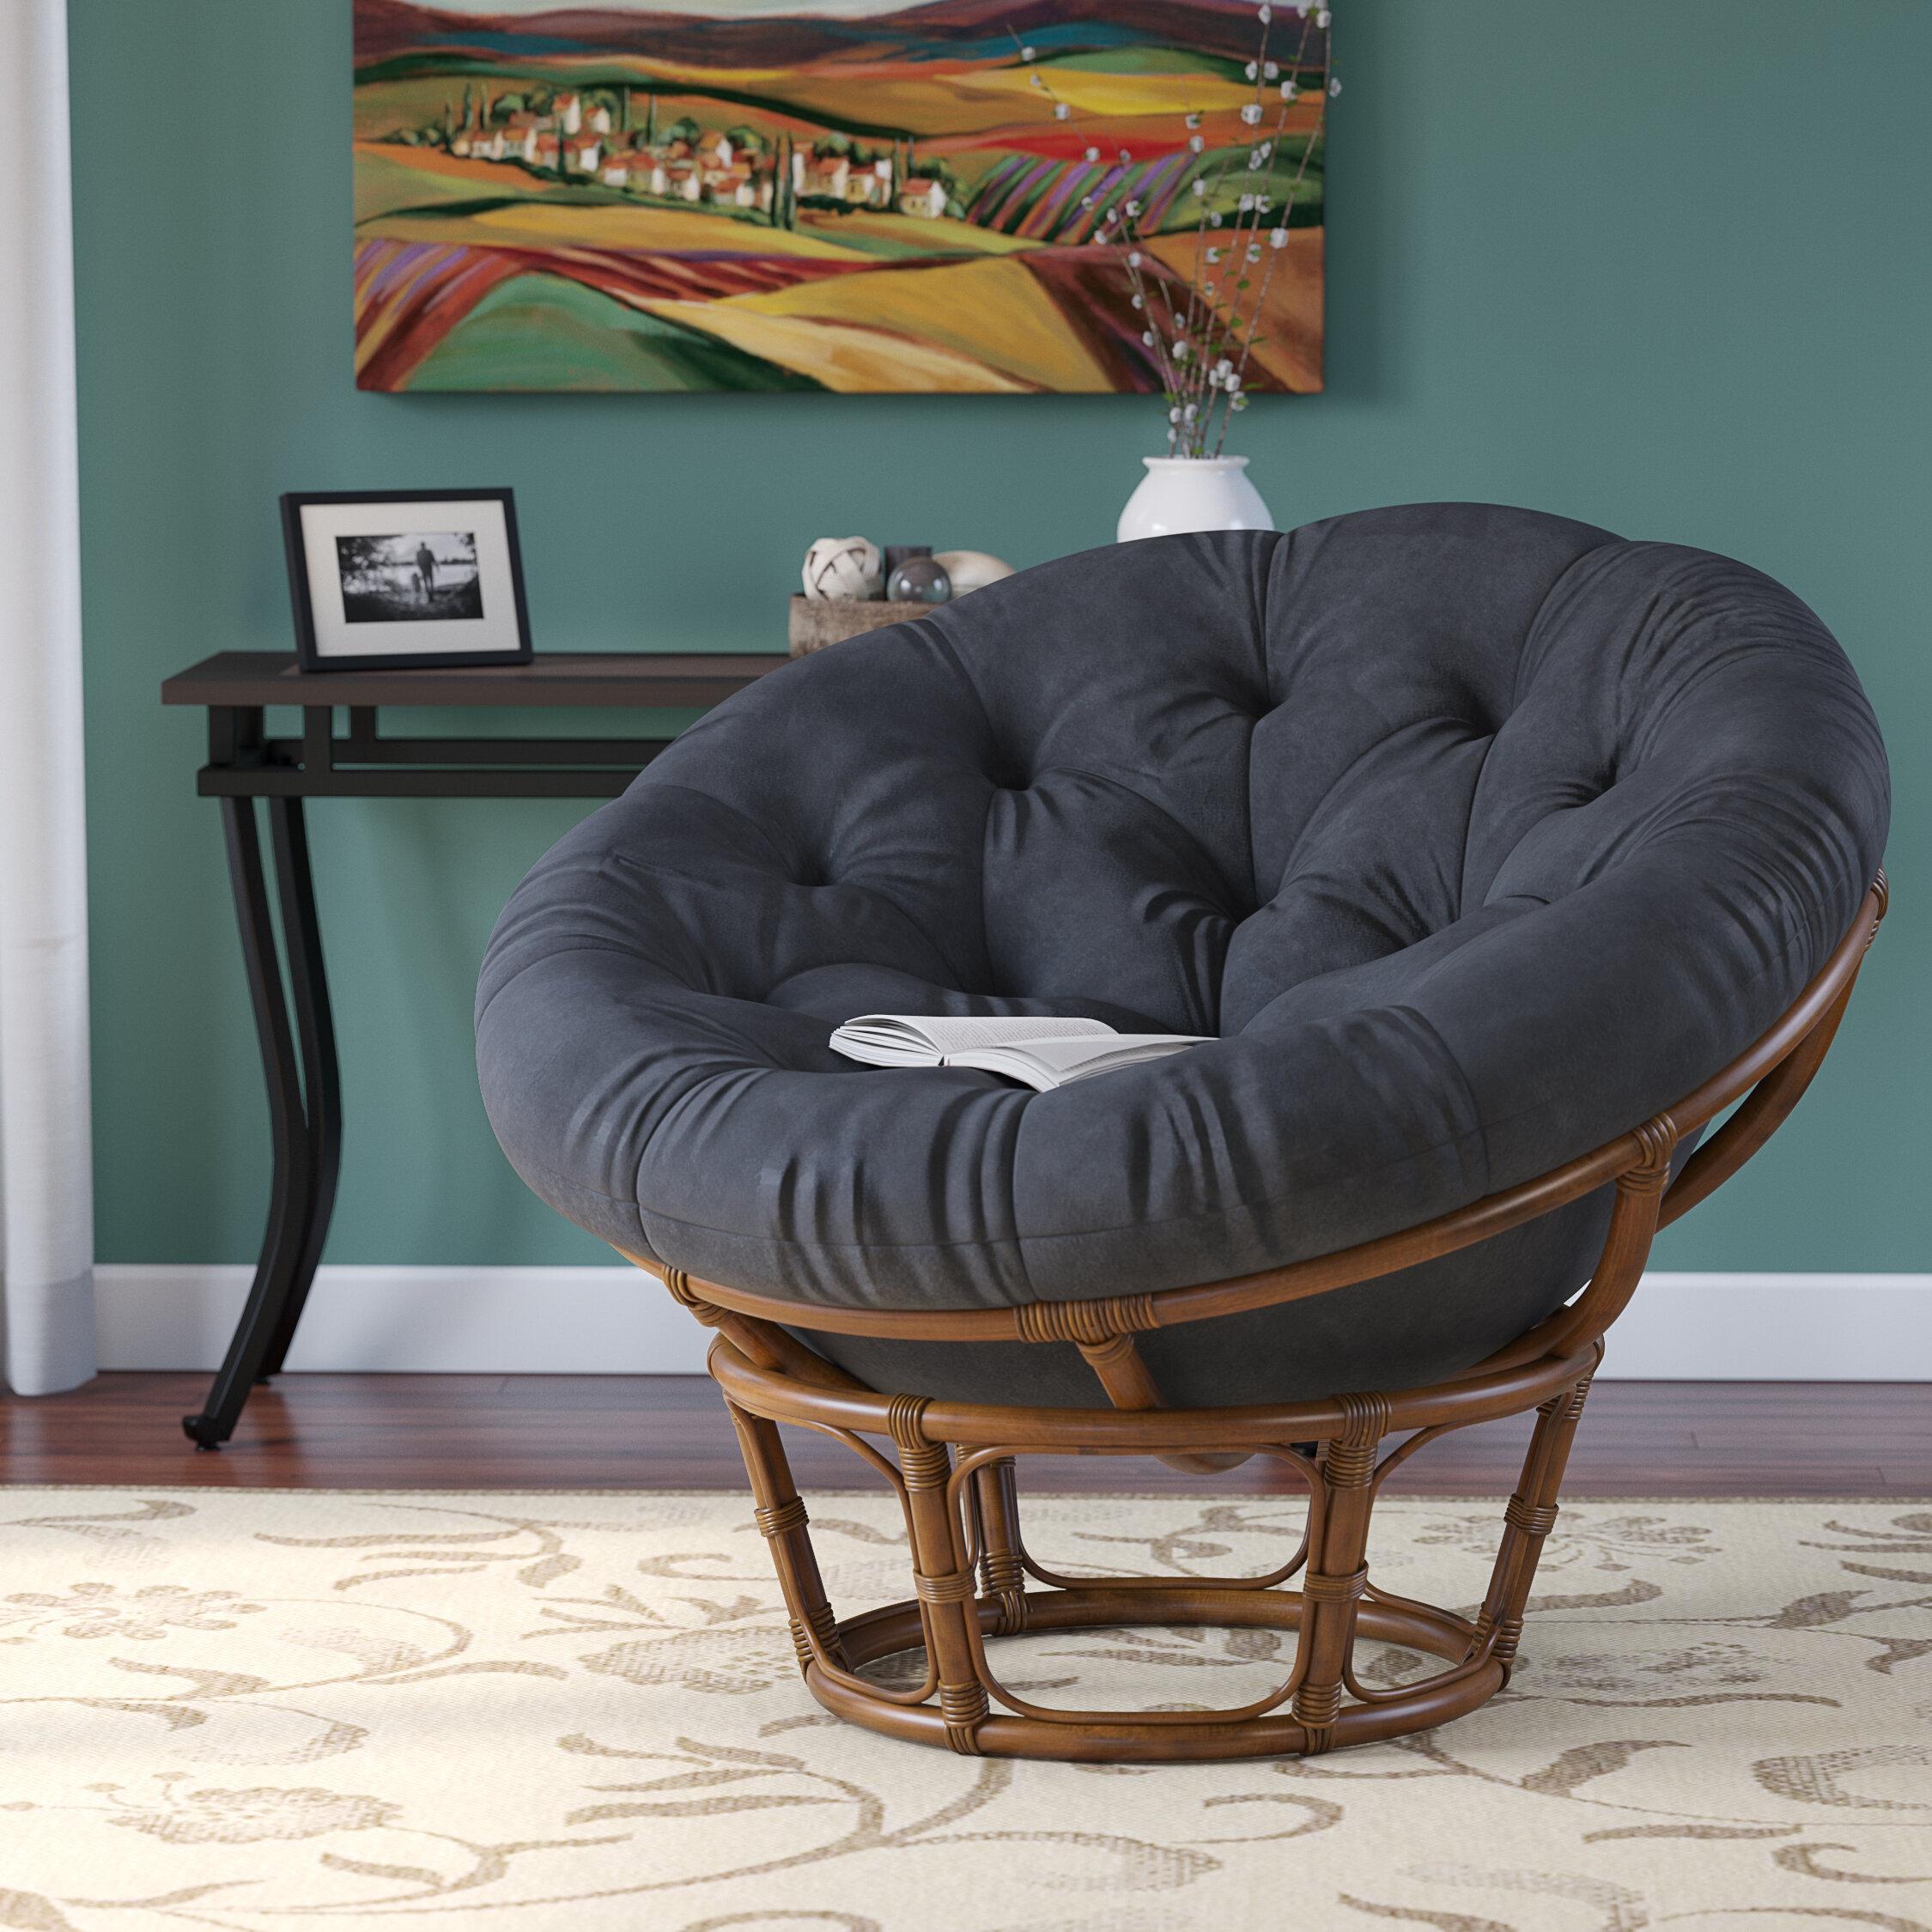 Double Papasan Chairs | Wayfair Regarding Orndorff Tufted Papasan Chairs (View 6 of 15)